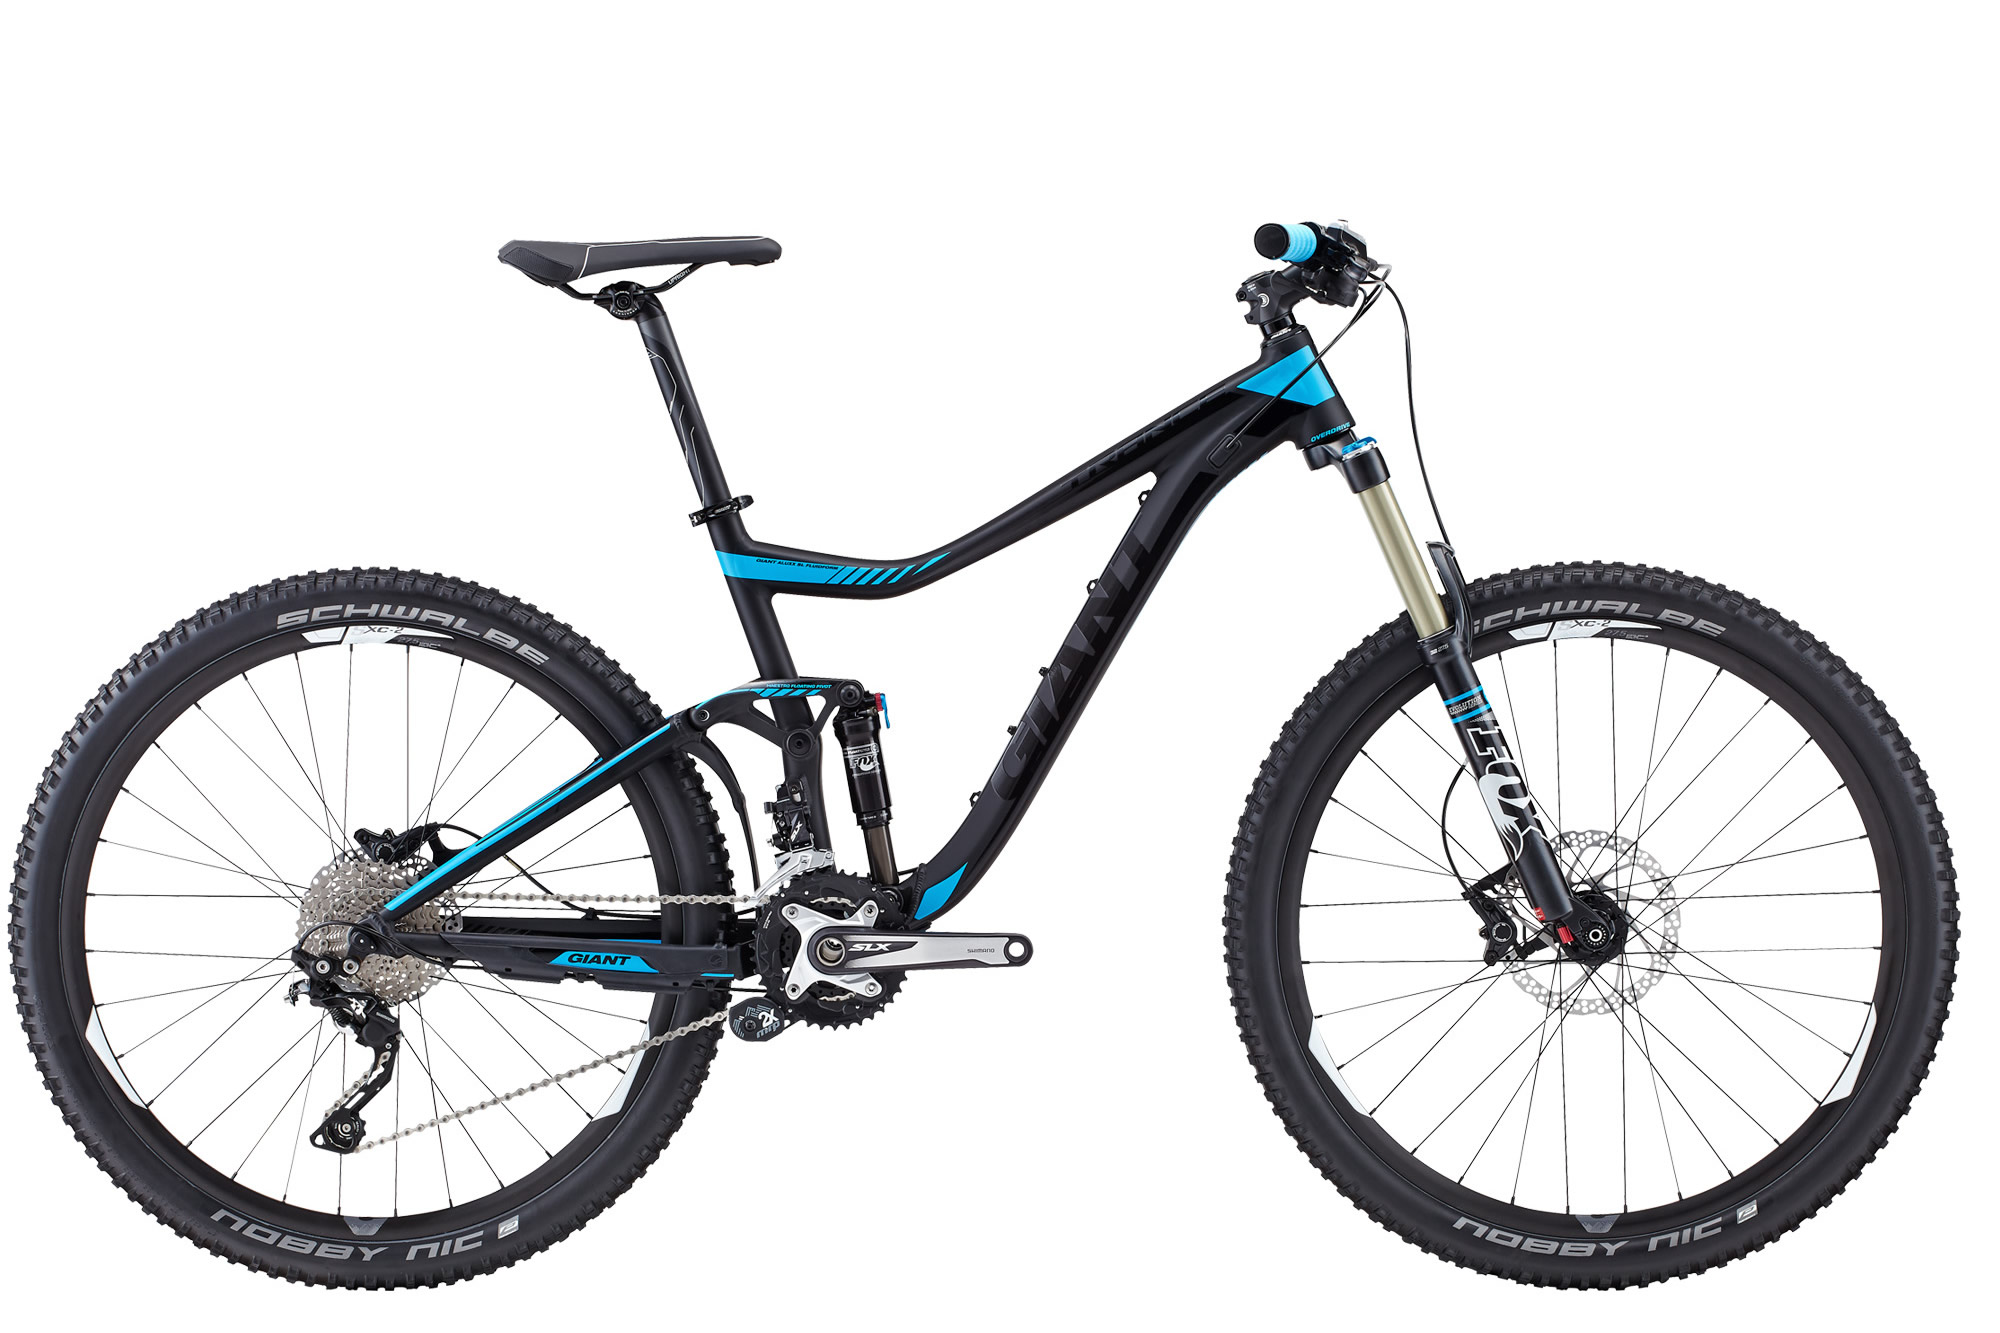 Giant Mountain-Bike Vollgefedert 27,5 mieten - Fahrrad Hesse